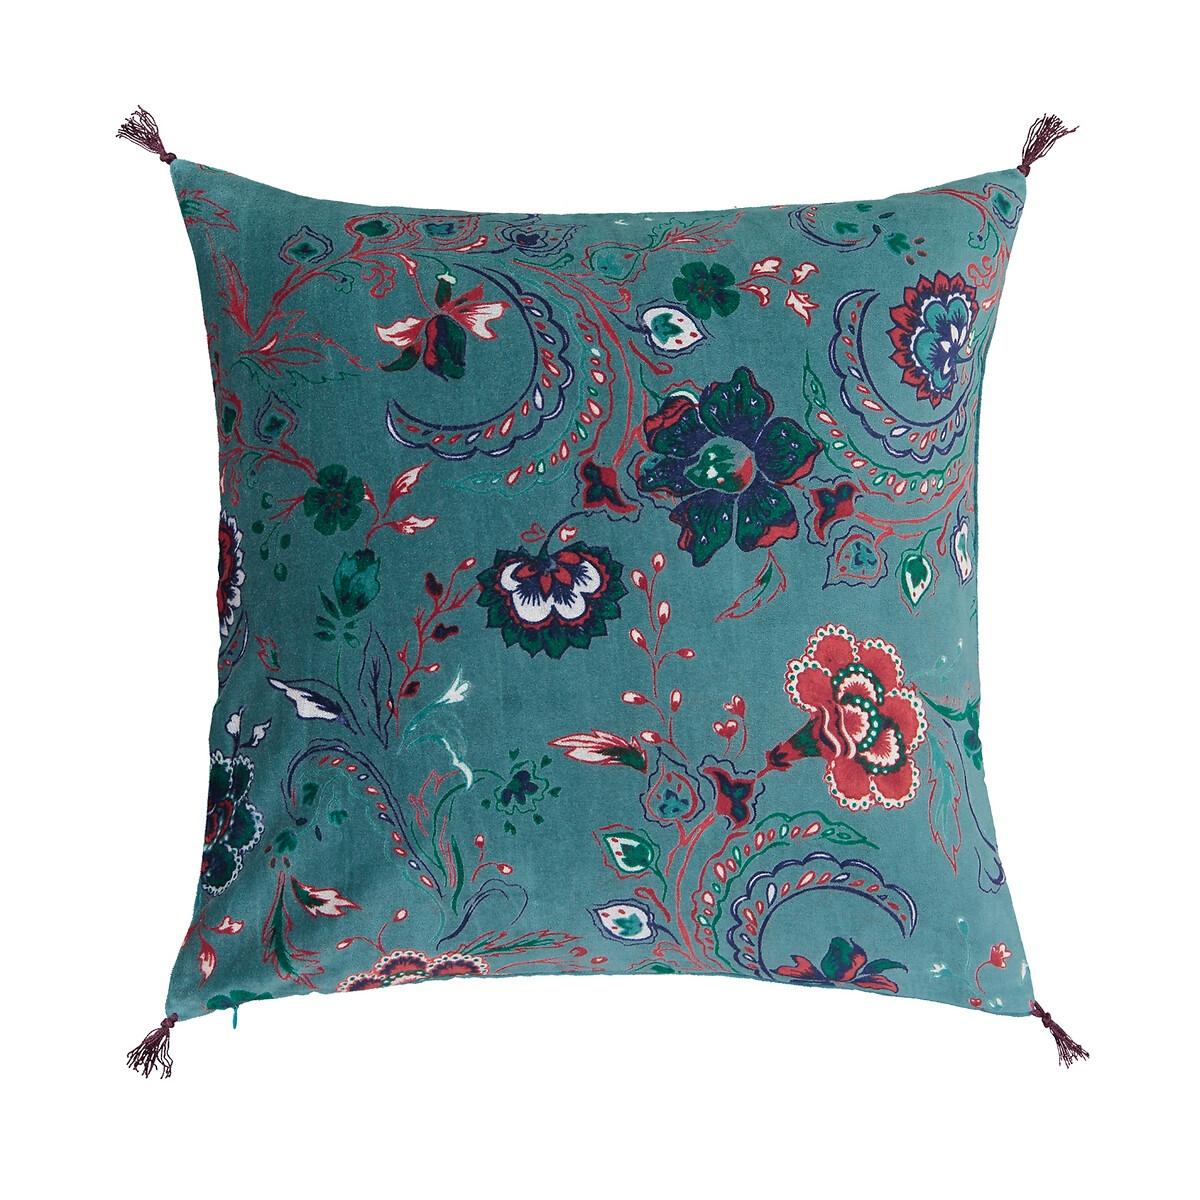 Фото - Чехол LaRedoute На подушку из велюра Paisley 45 x 45 см синий чехол laredoute на подушку валик с отделкой бисером volodia 45 x 45 см зеленый